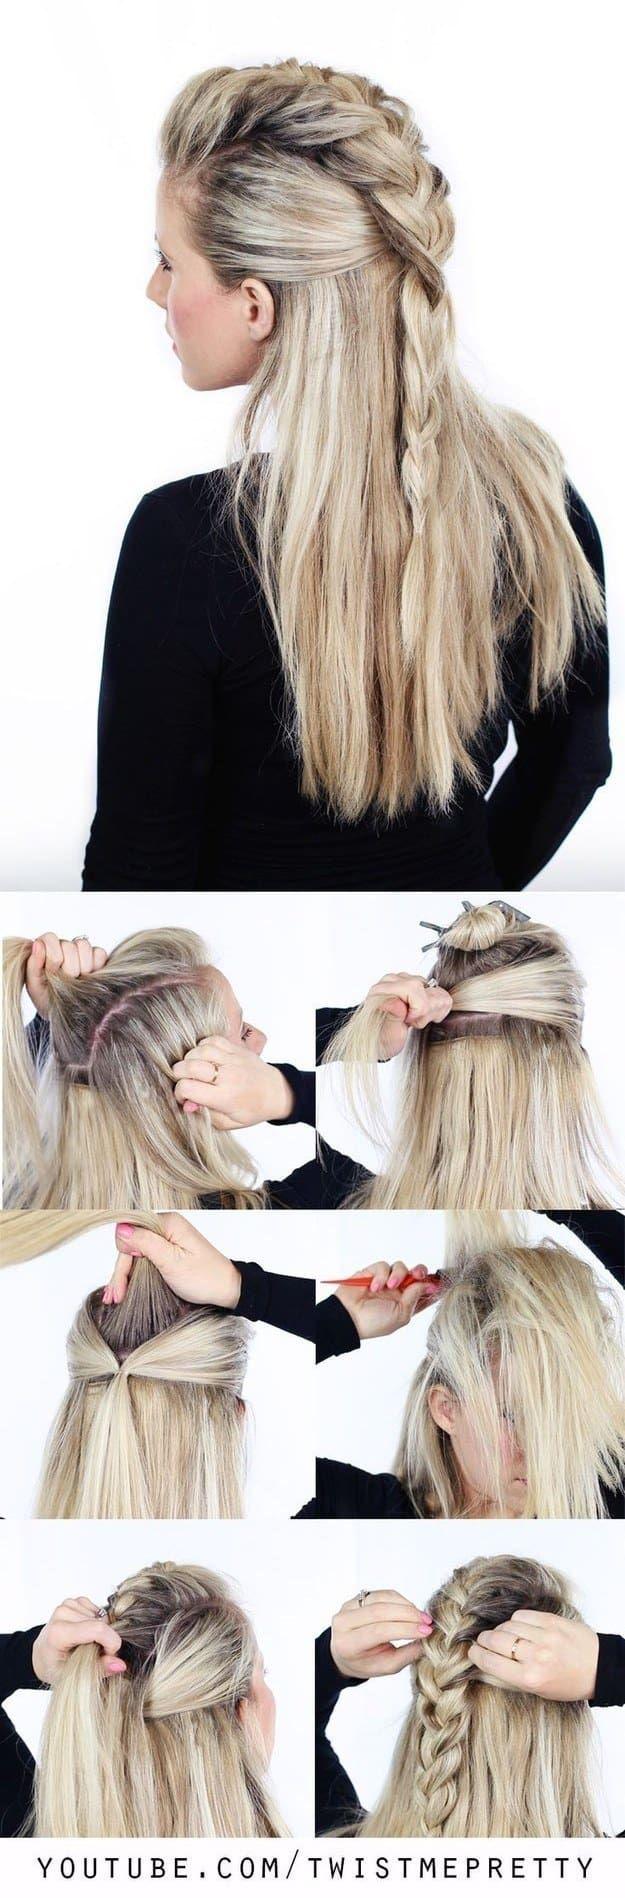 tutoriales de trenzas que querrás probar easy hair hair style